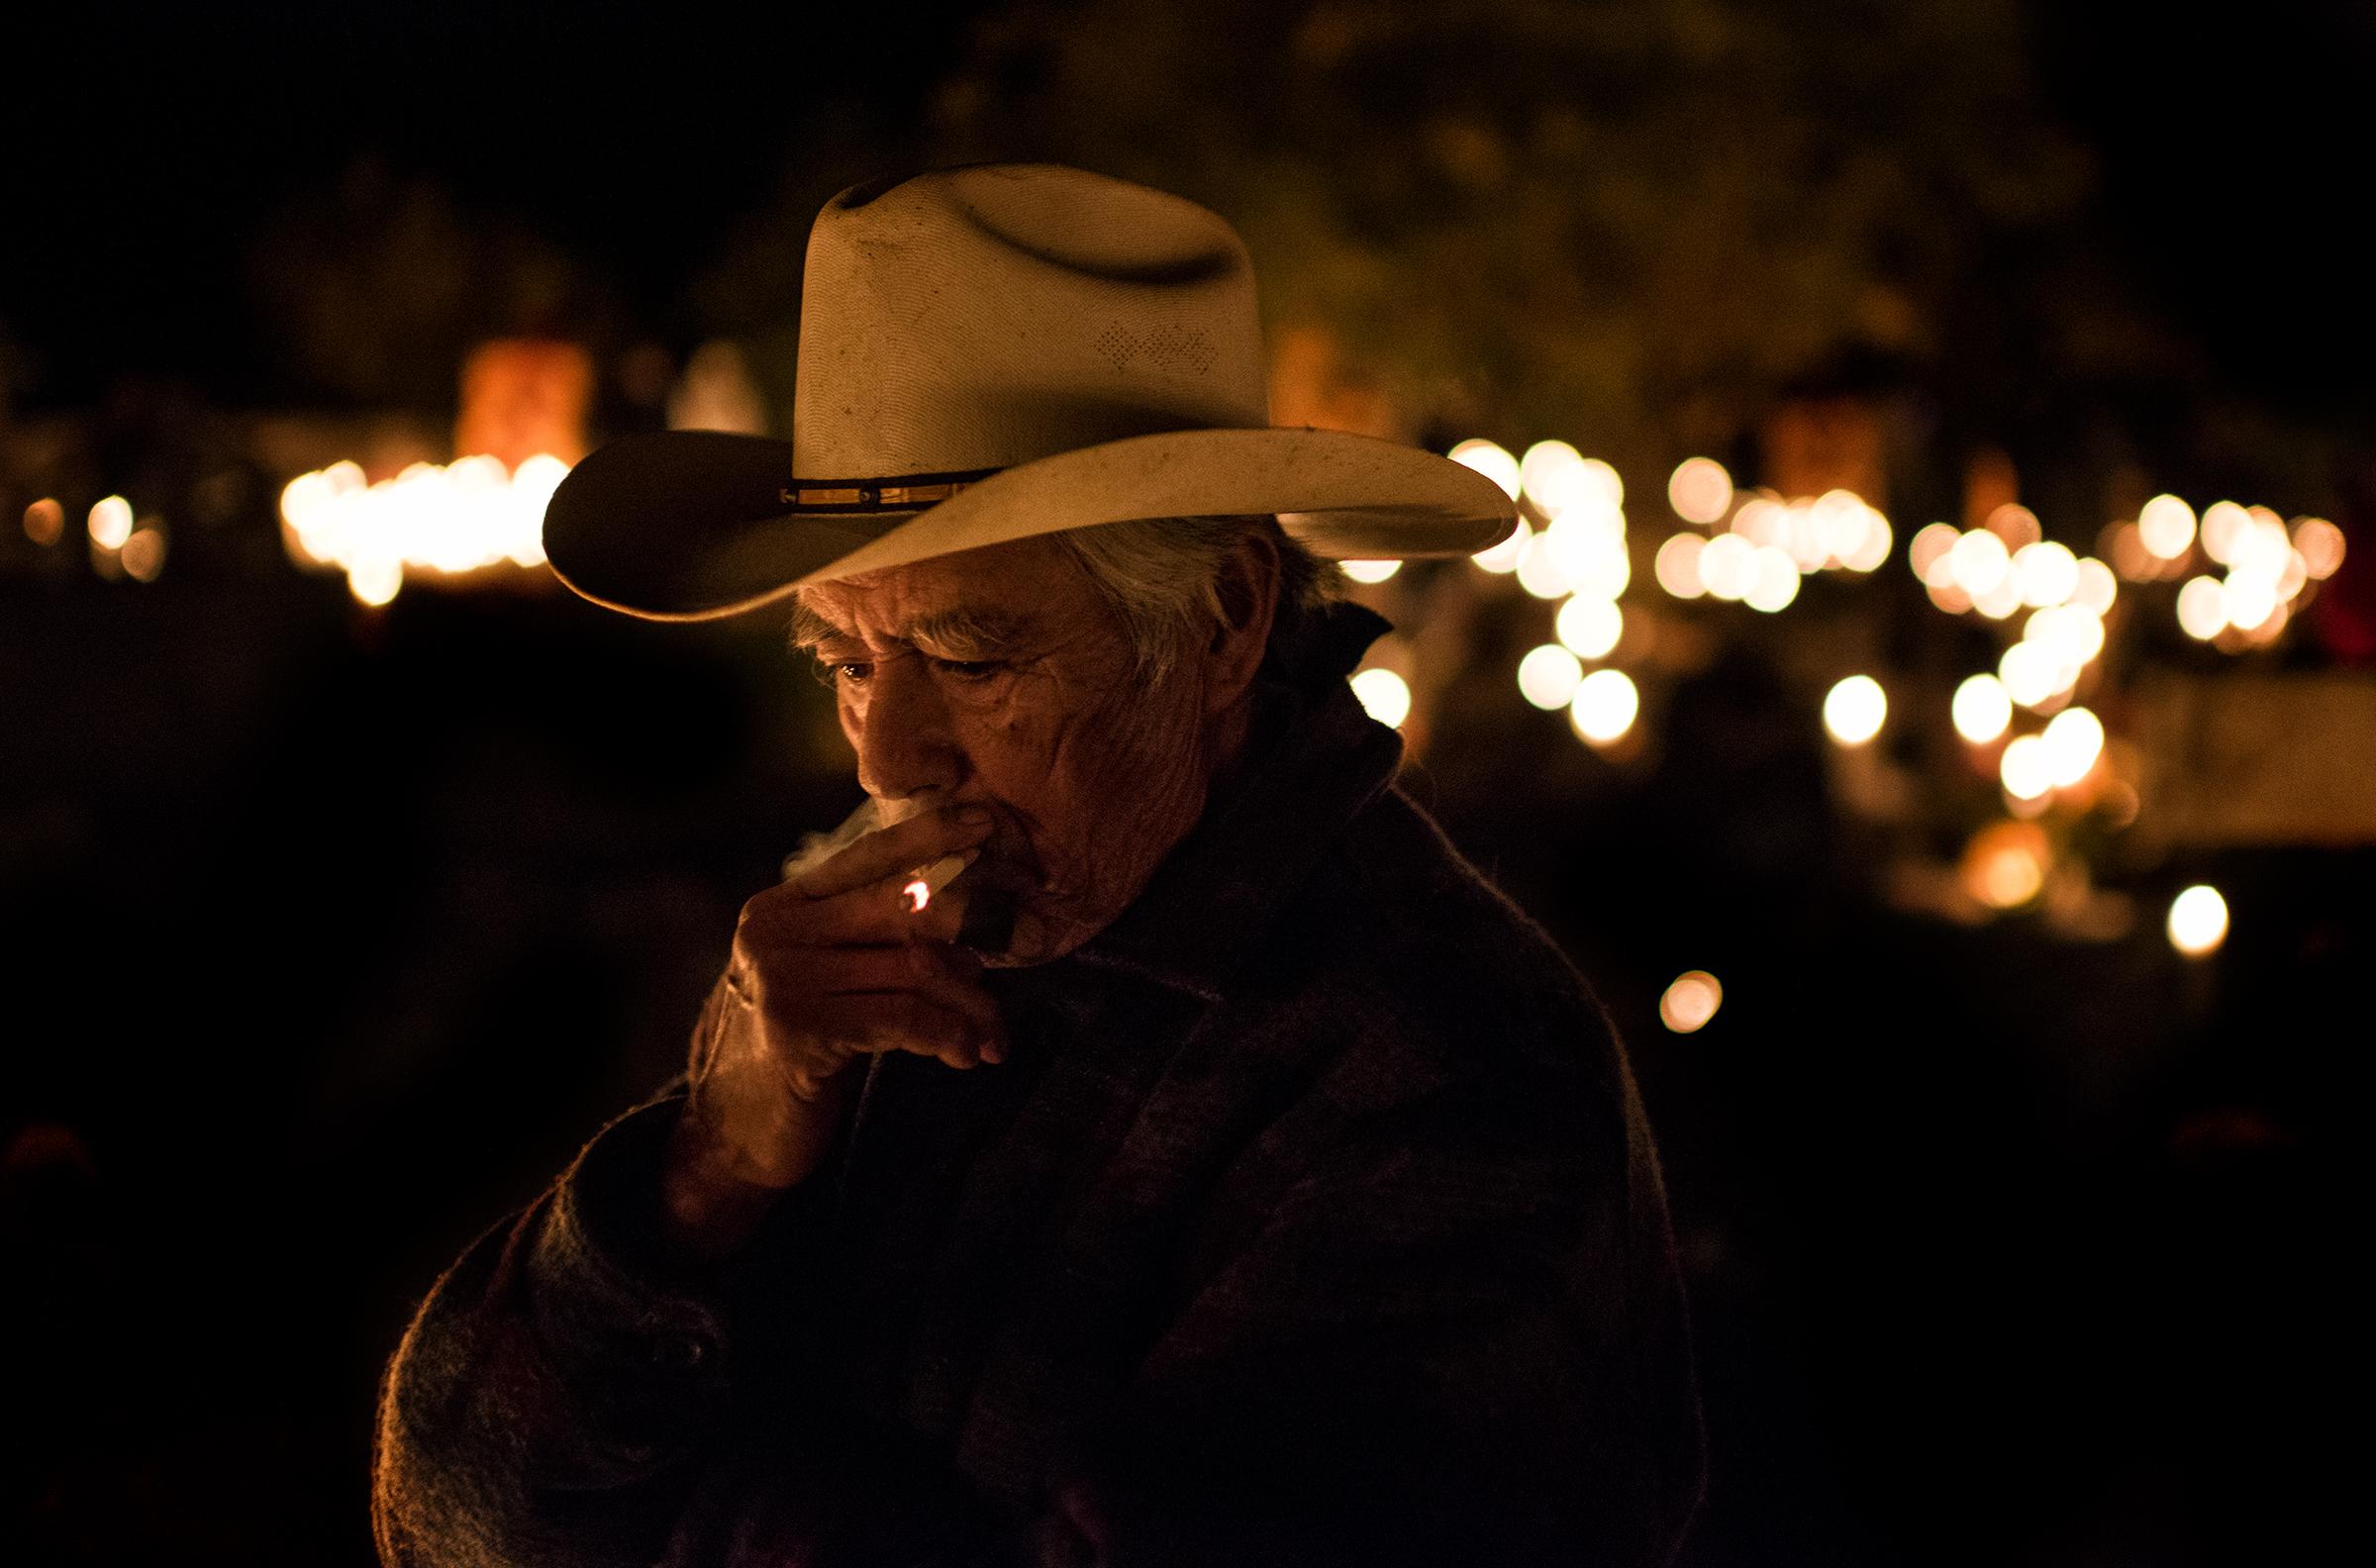 A man smokes a cigarette by his family's altar on a Lake Pátzcuaro island.